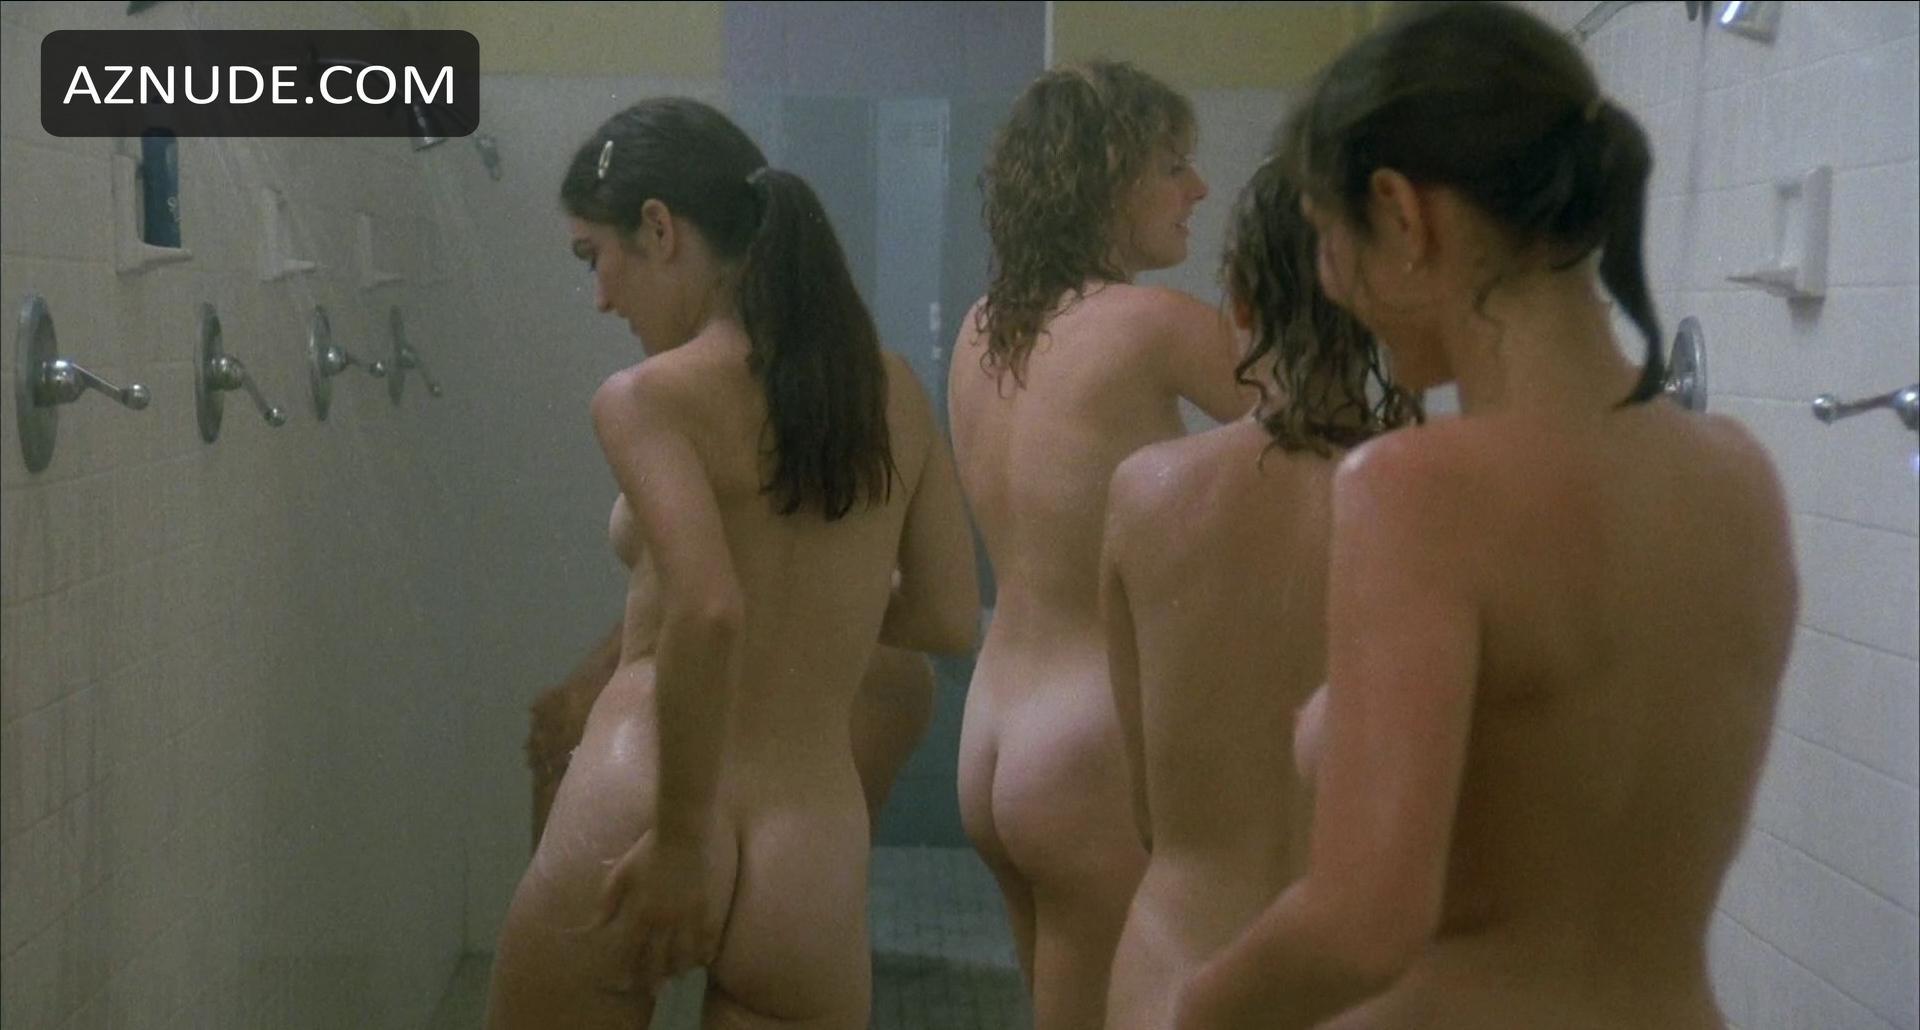 Nude women beach pics